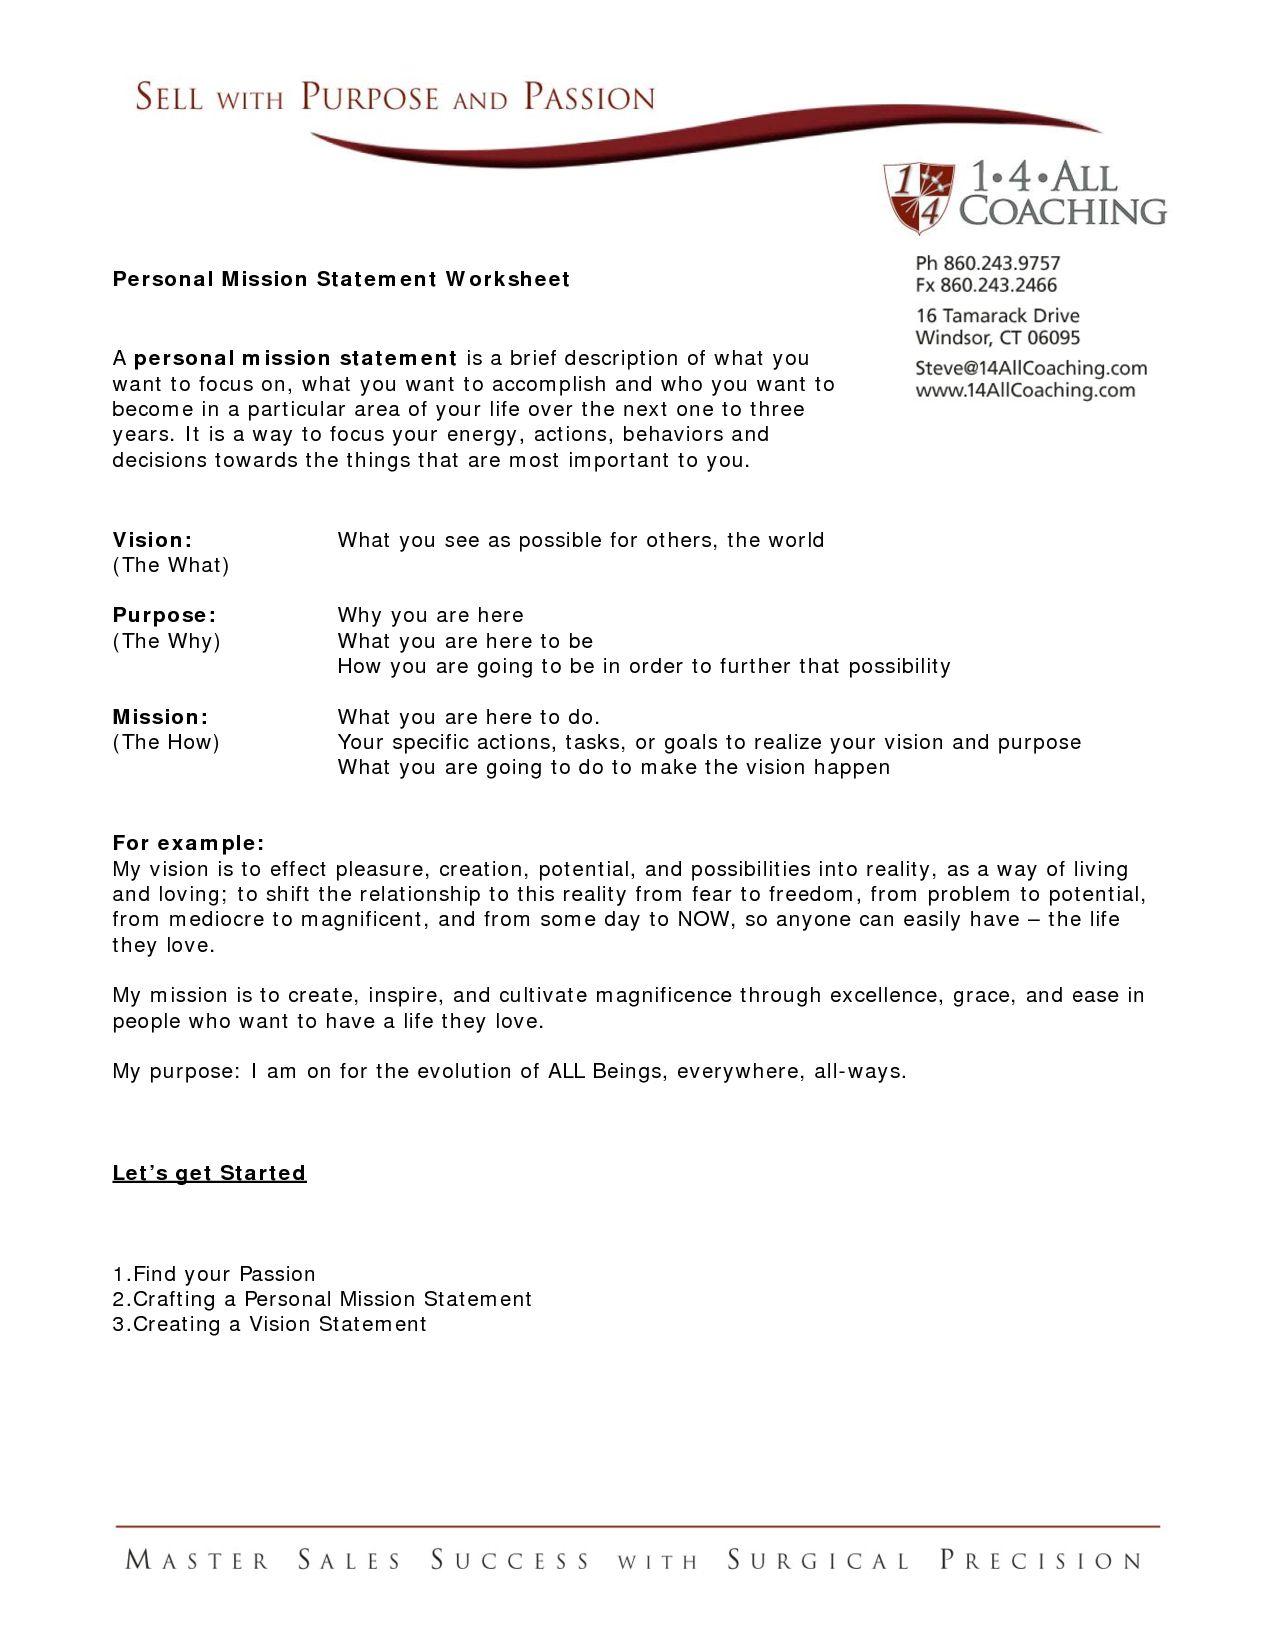 Family Mission Statement Worksheet